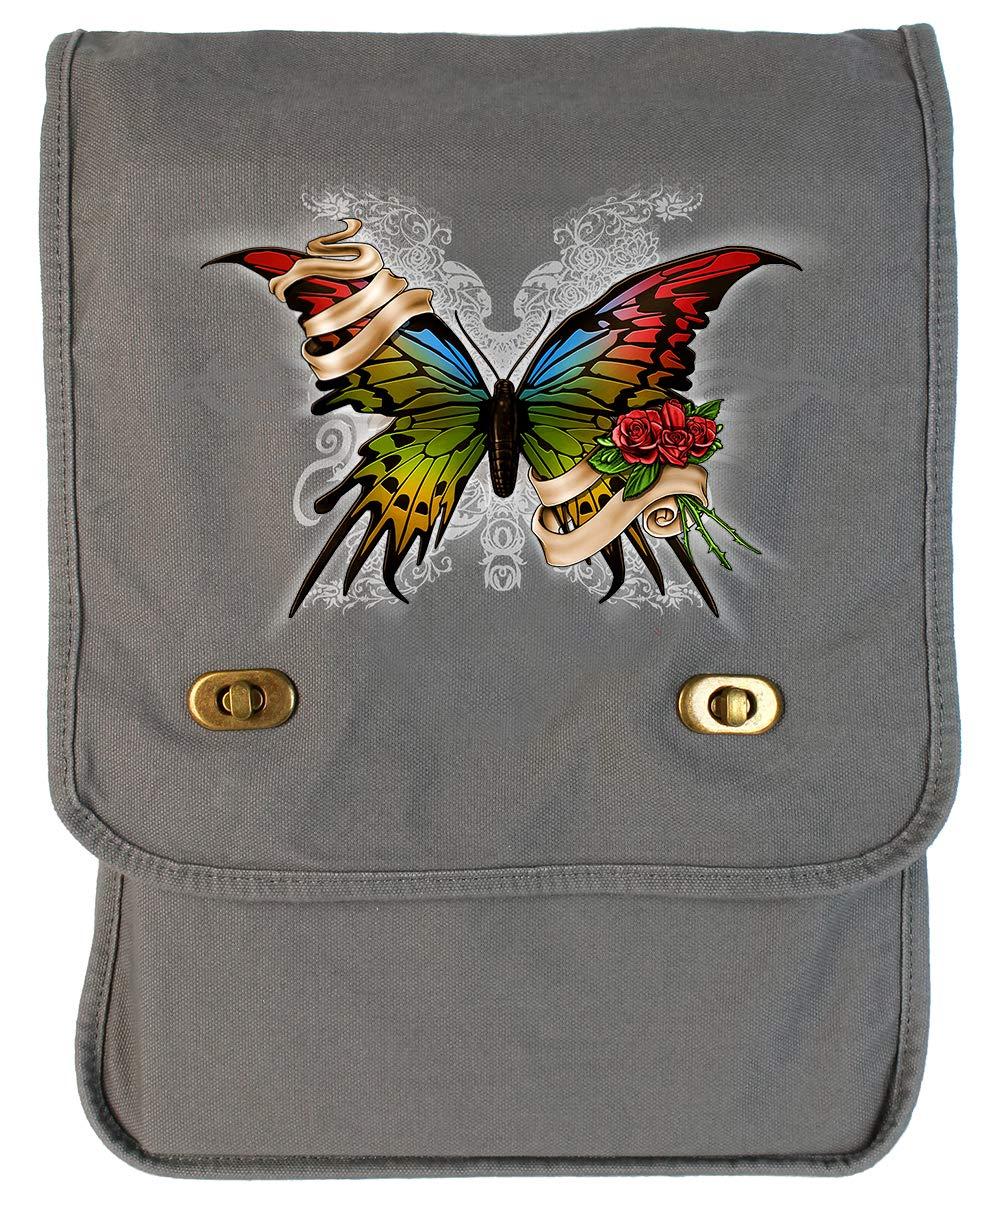 Tenacitee Butterfly Flamingo Raw Edge Canvas Messenger Bag